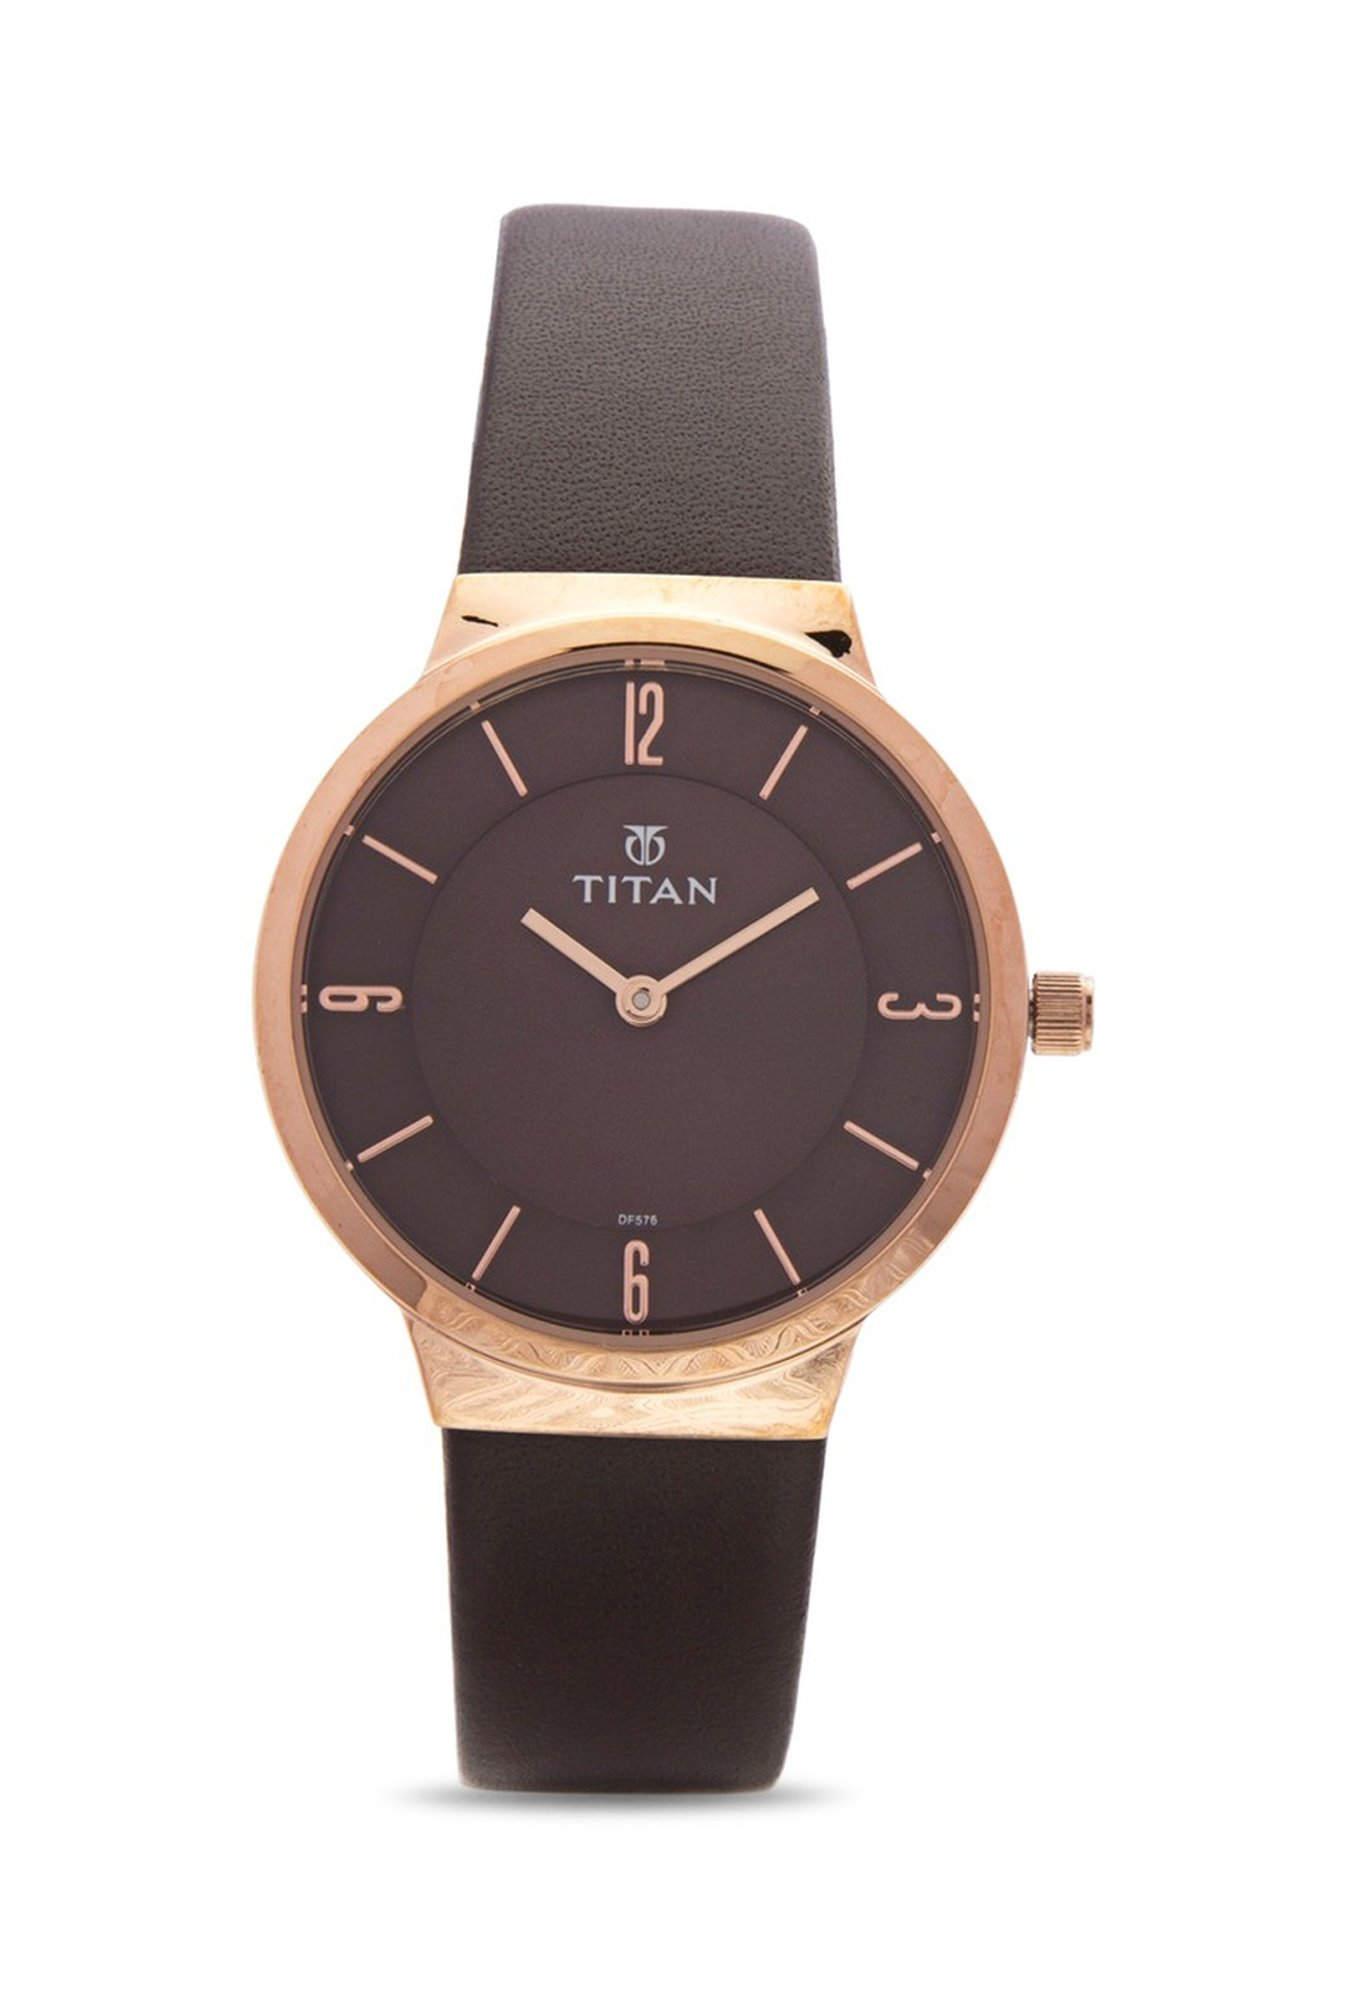 Titan 95033WL01 Brown Analogue Women's Watch (95033WL01)